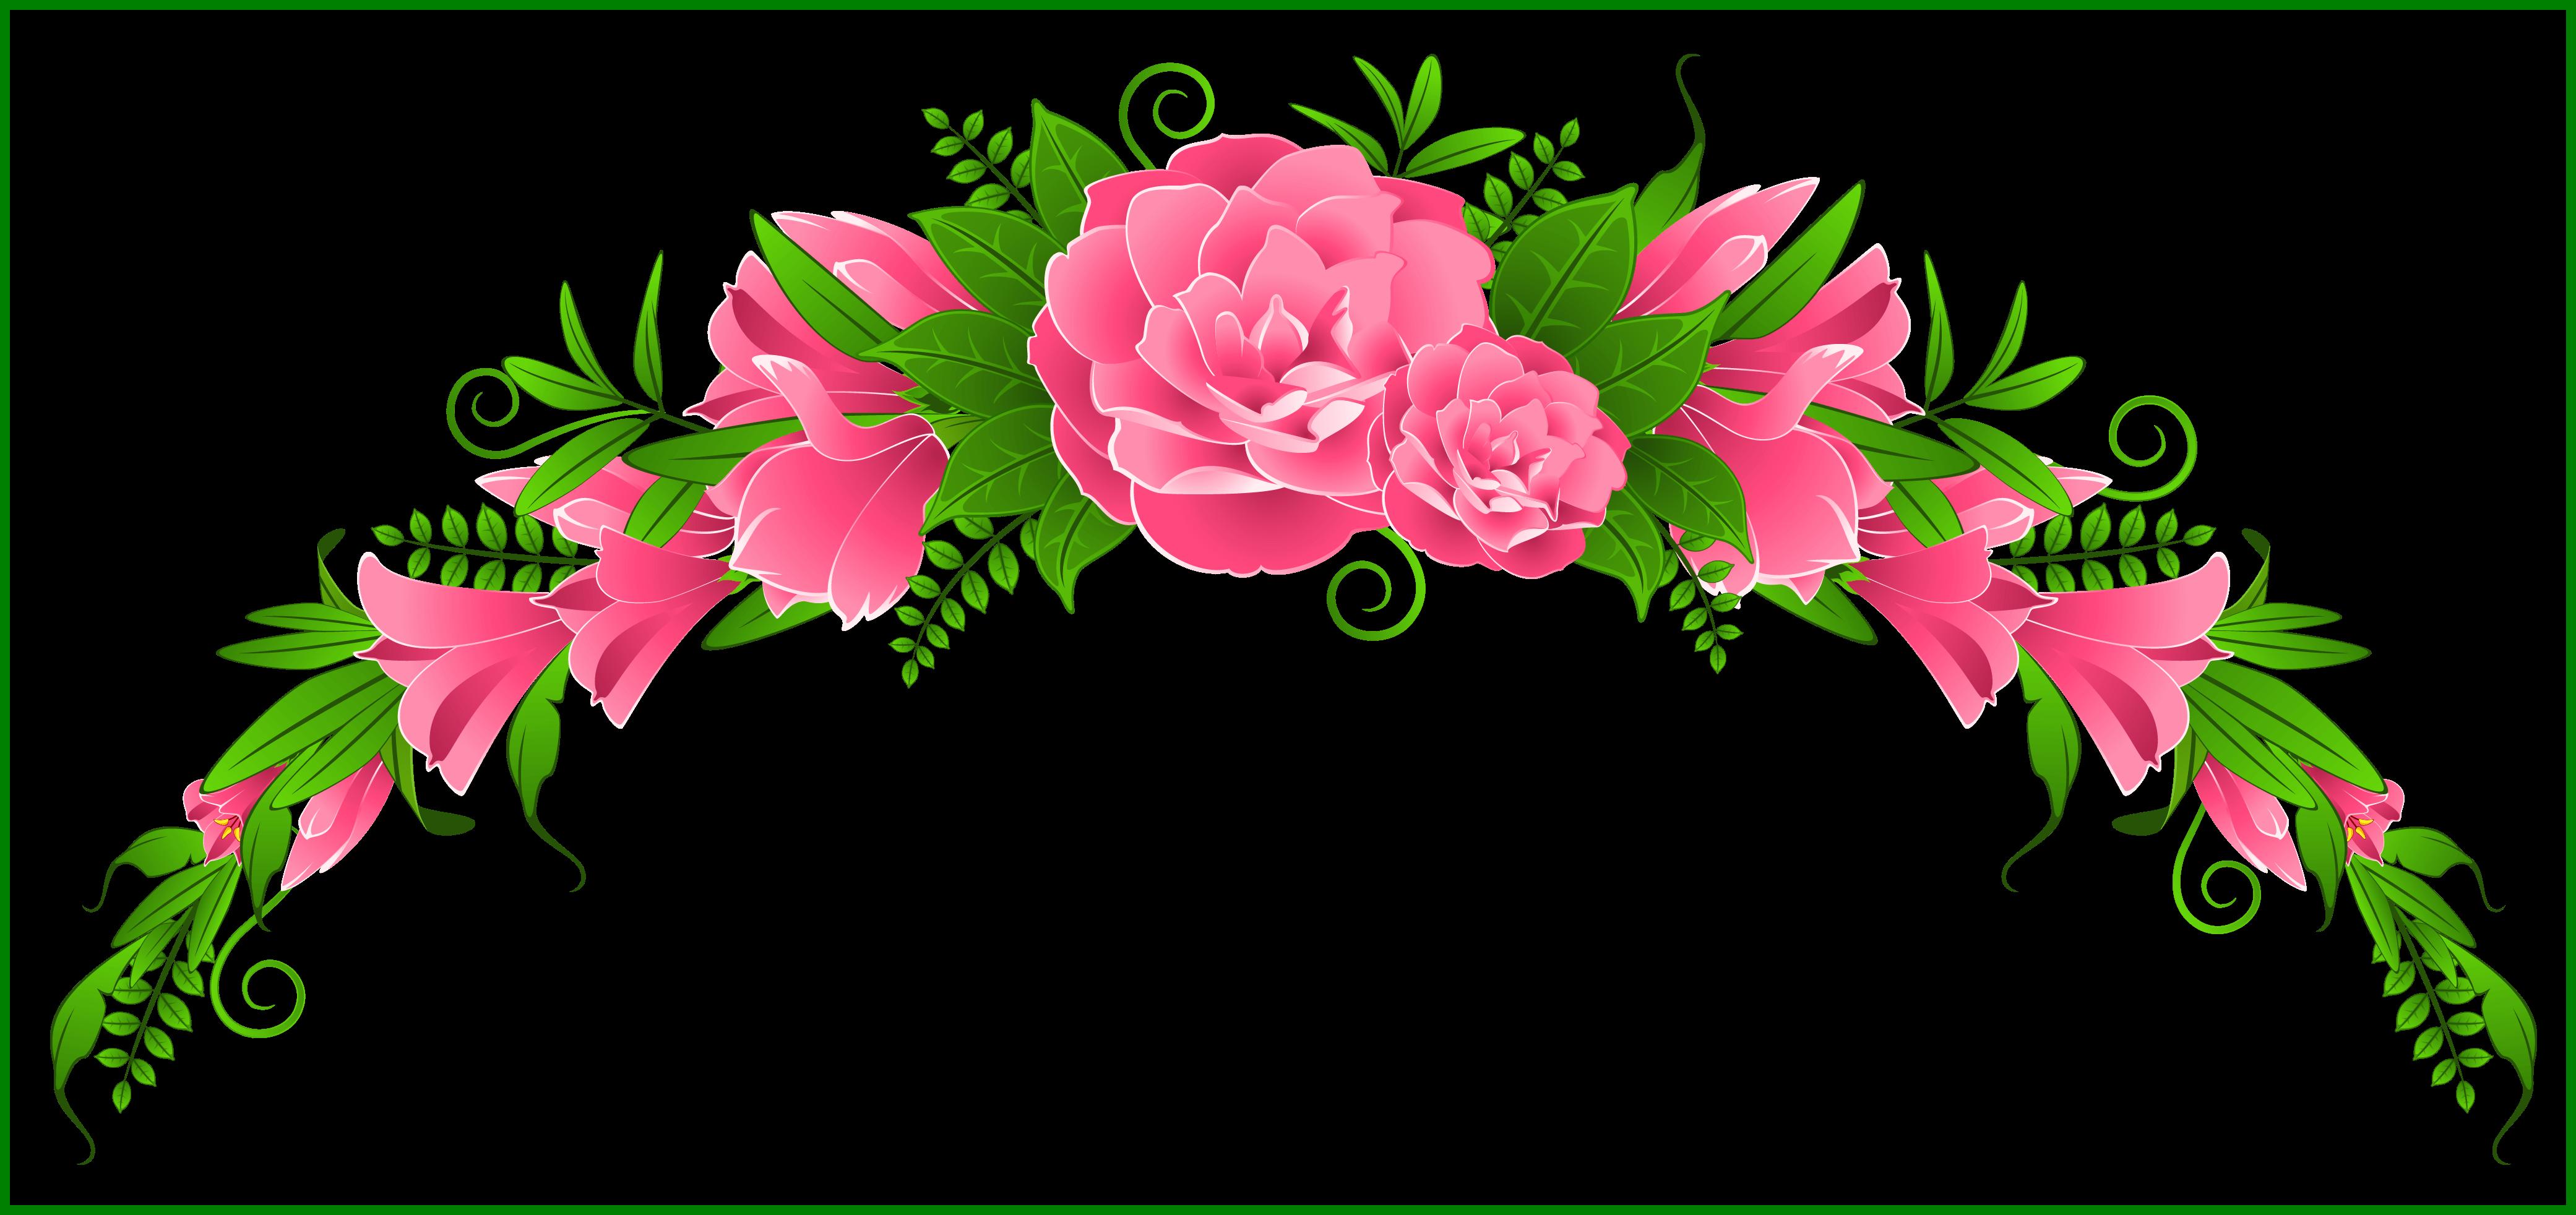 Flower design png. Shocking pink and element